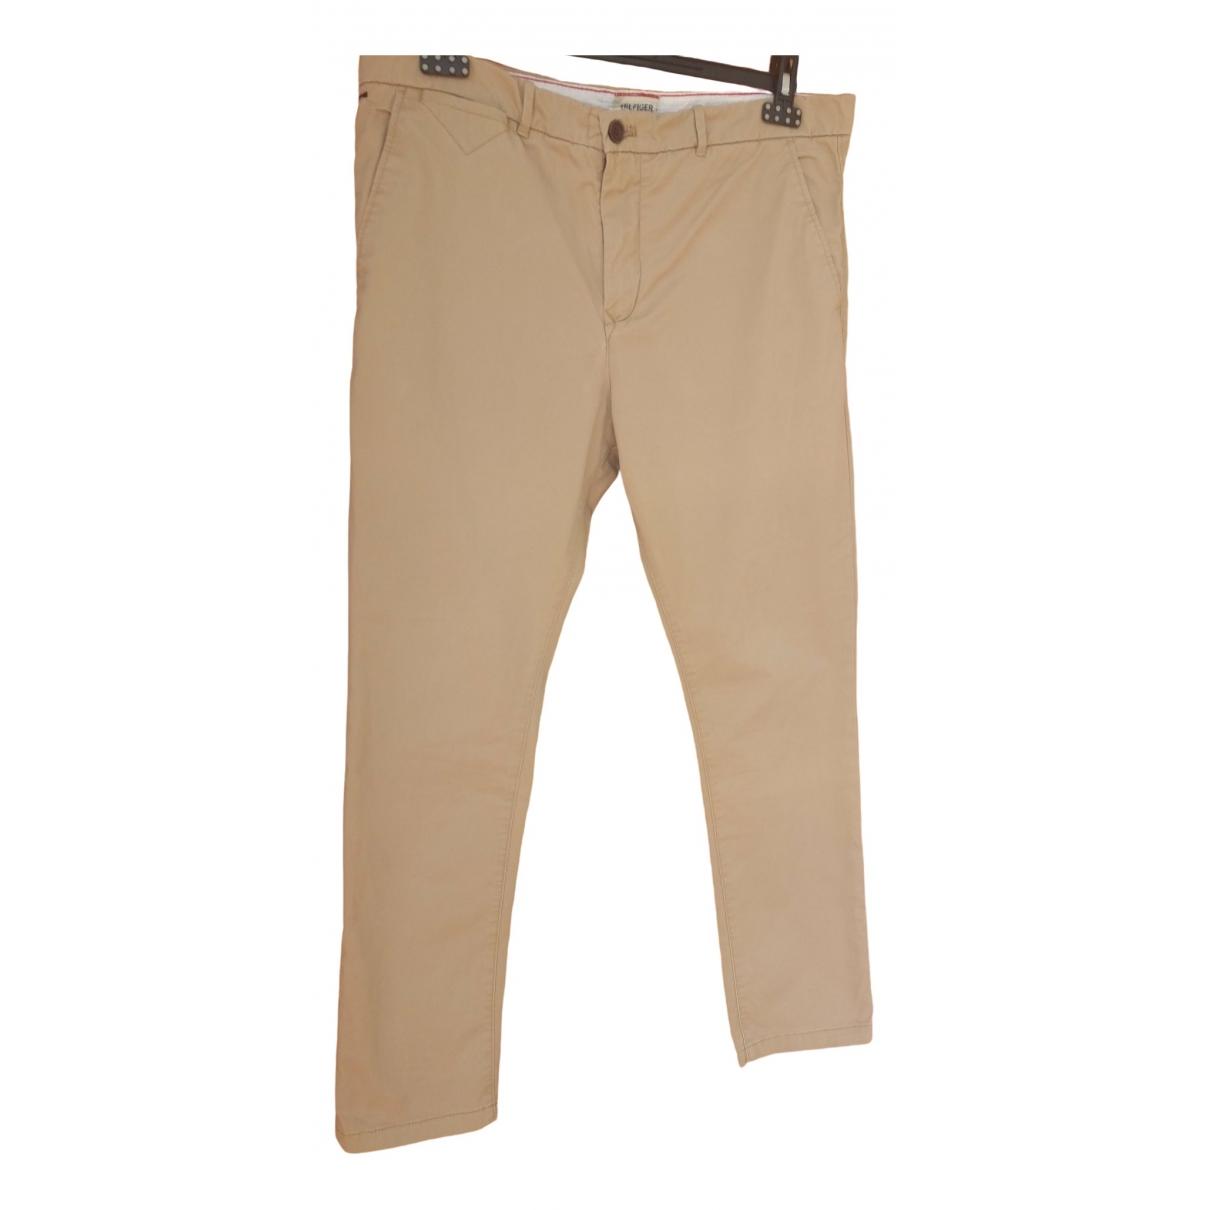 Tommy Hilfiger \N Beige Cotton Trousers for Men 36 UK - US